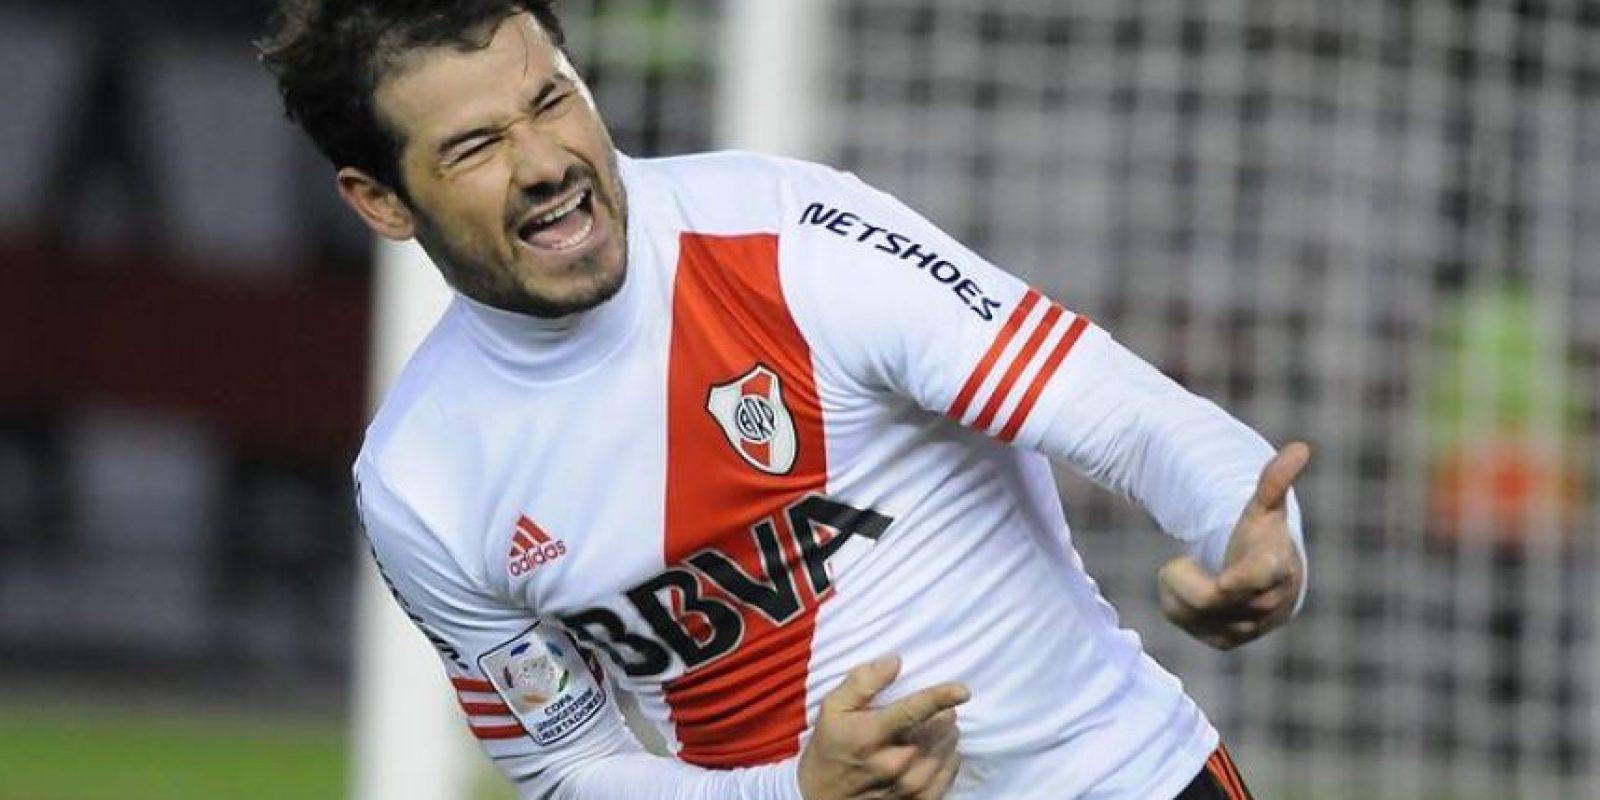 Guaraní recibe a River Plate en Asunción para la semifinal de vuelta en la Copa Libertadores. Foto:Vía facebook.com/riverplateoficial